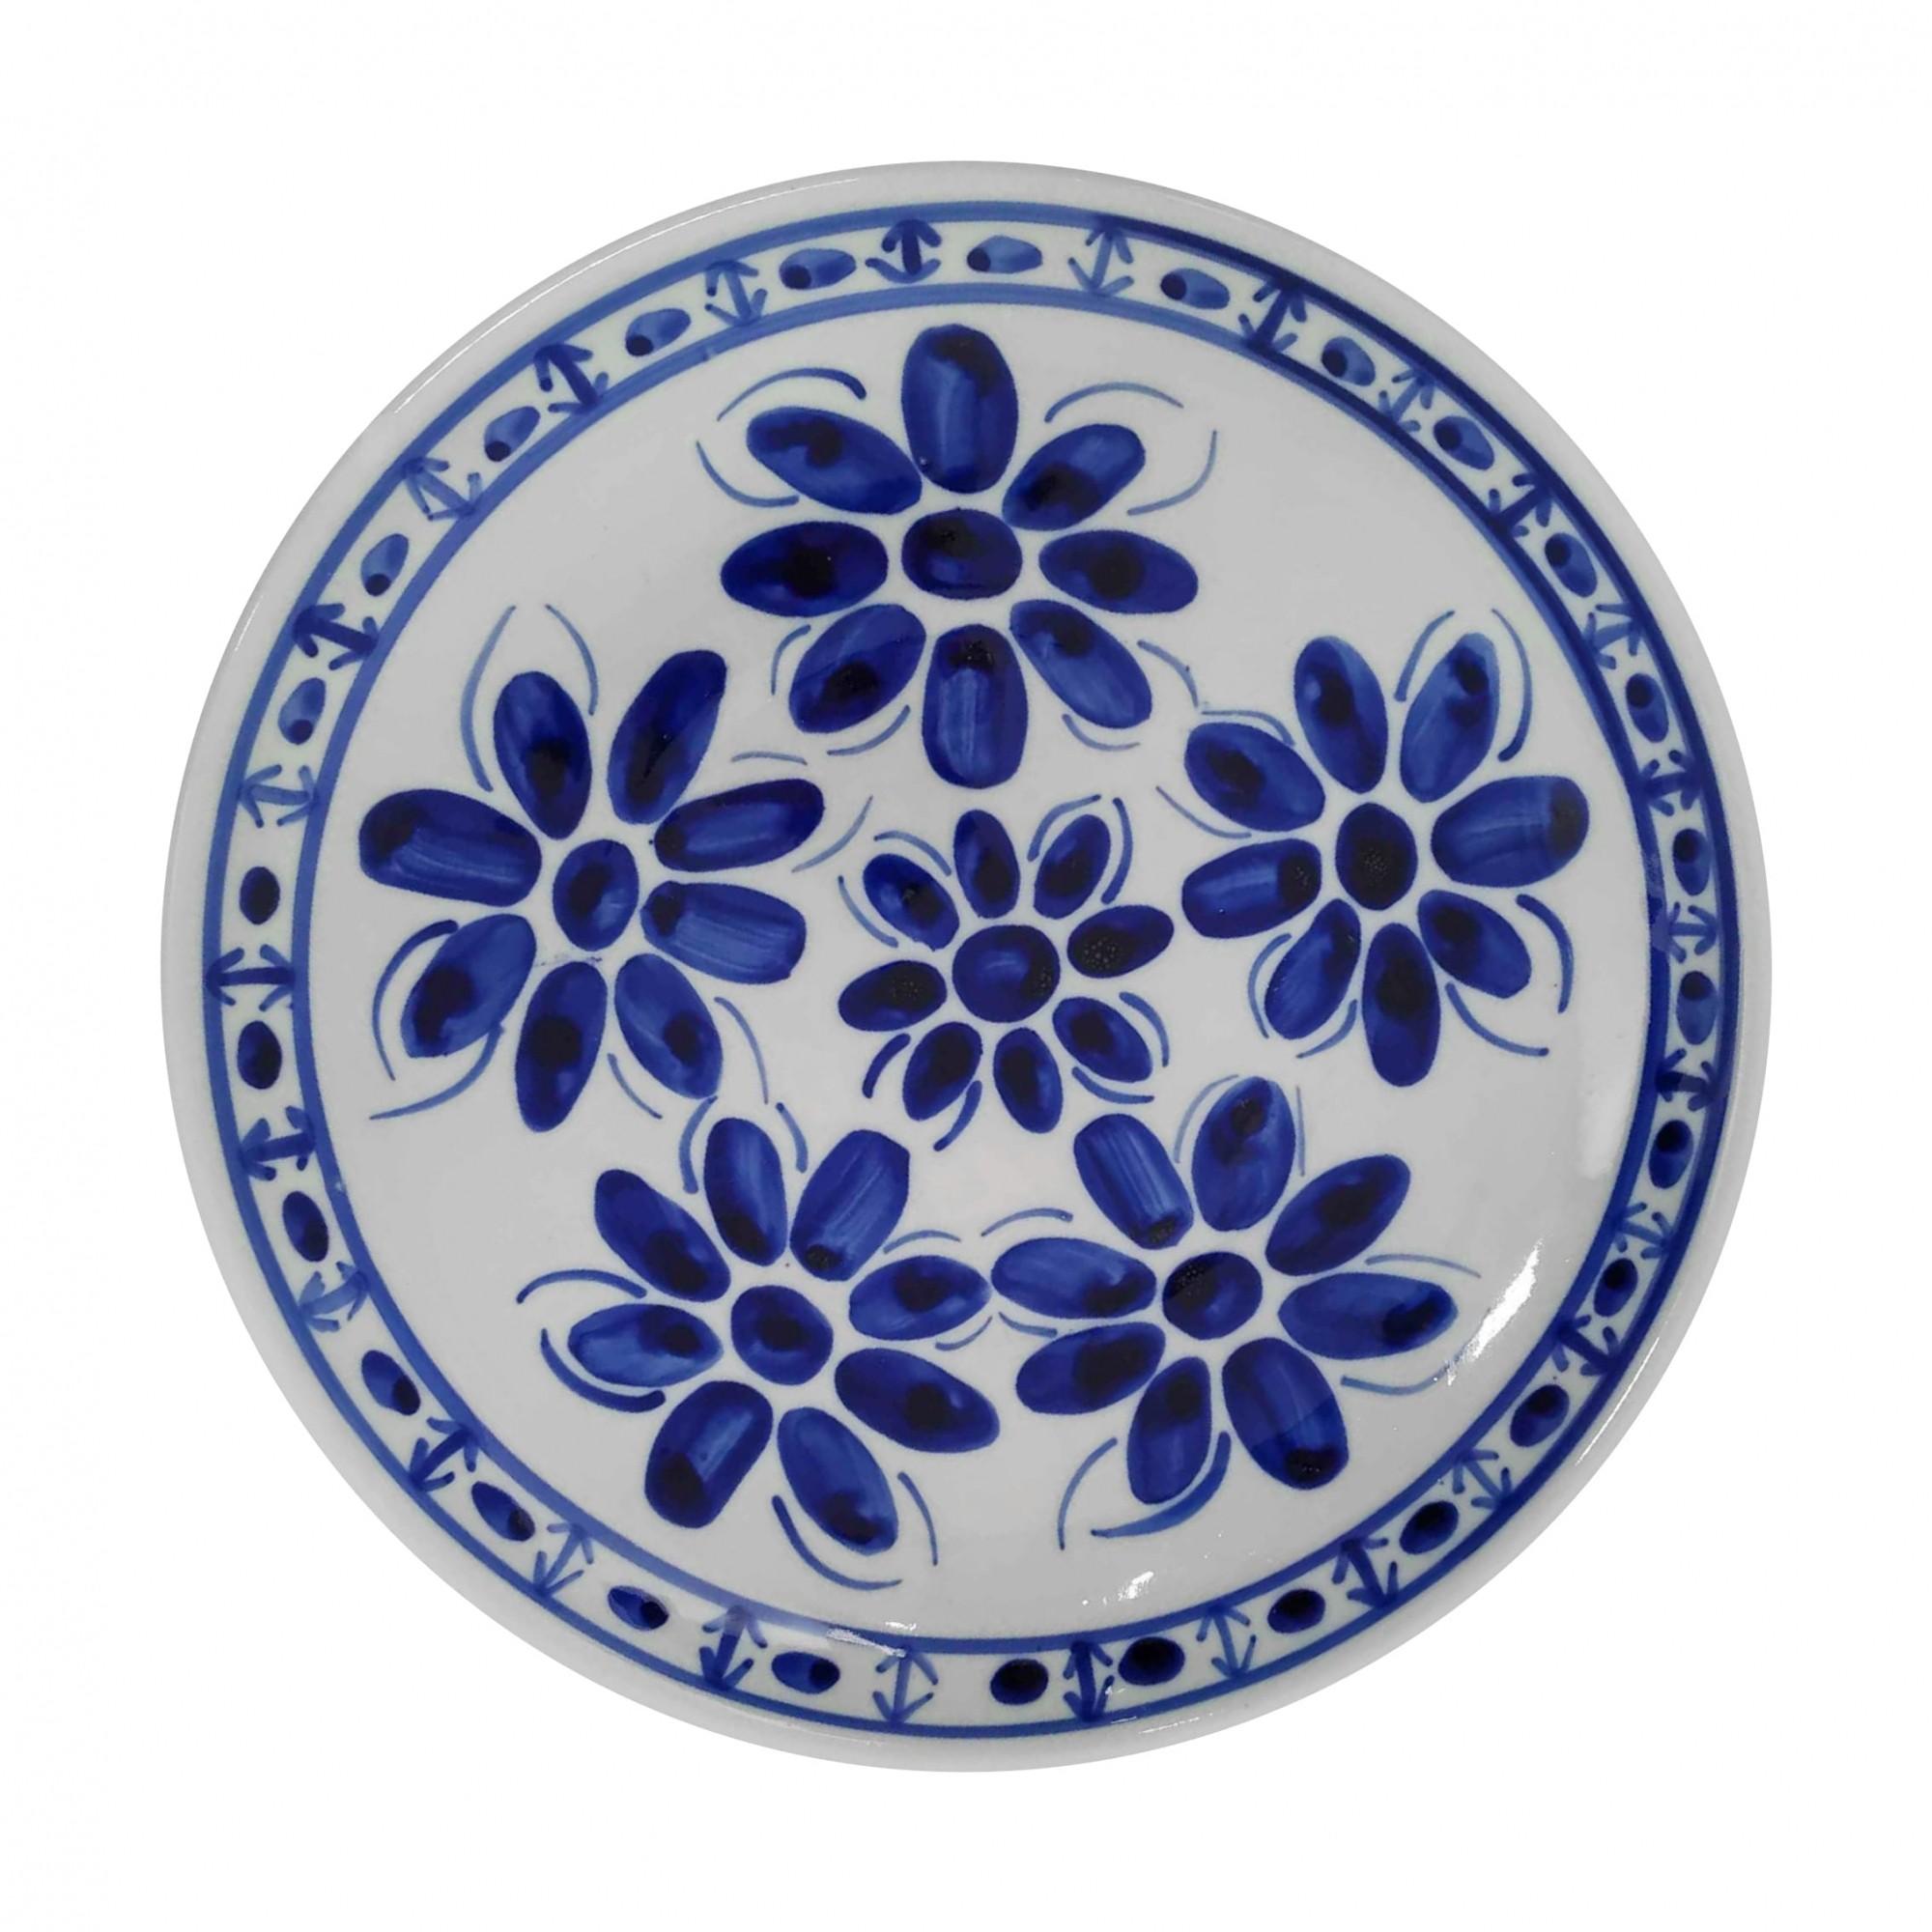 Prato Raso 22,5 cm Porcelana Azul Colonial